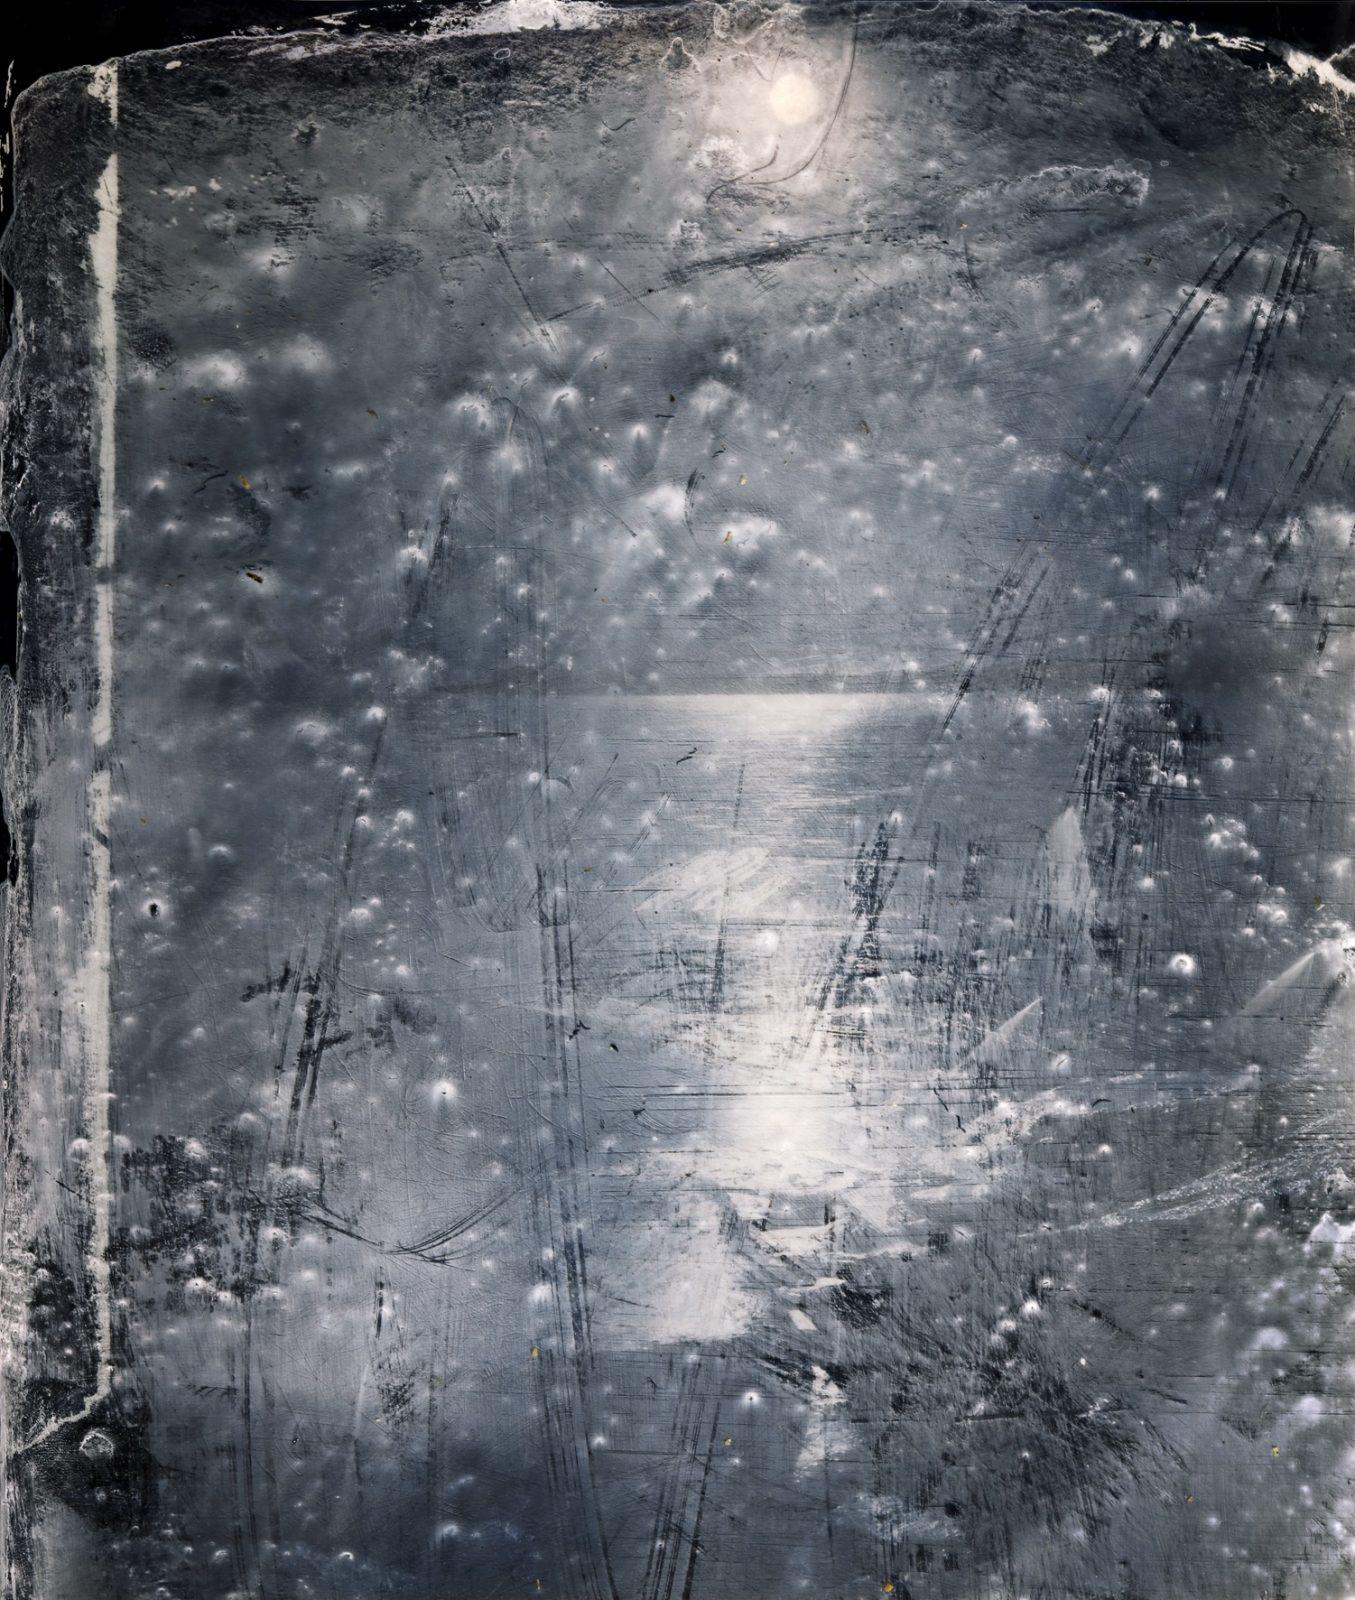 NIGHT NAVIGATOR, 2019, 55 x 46,5 cm, archival pigment print, frame